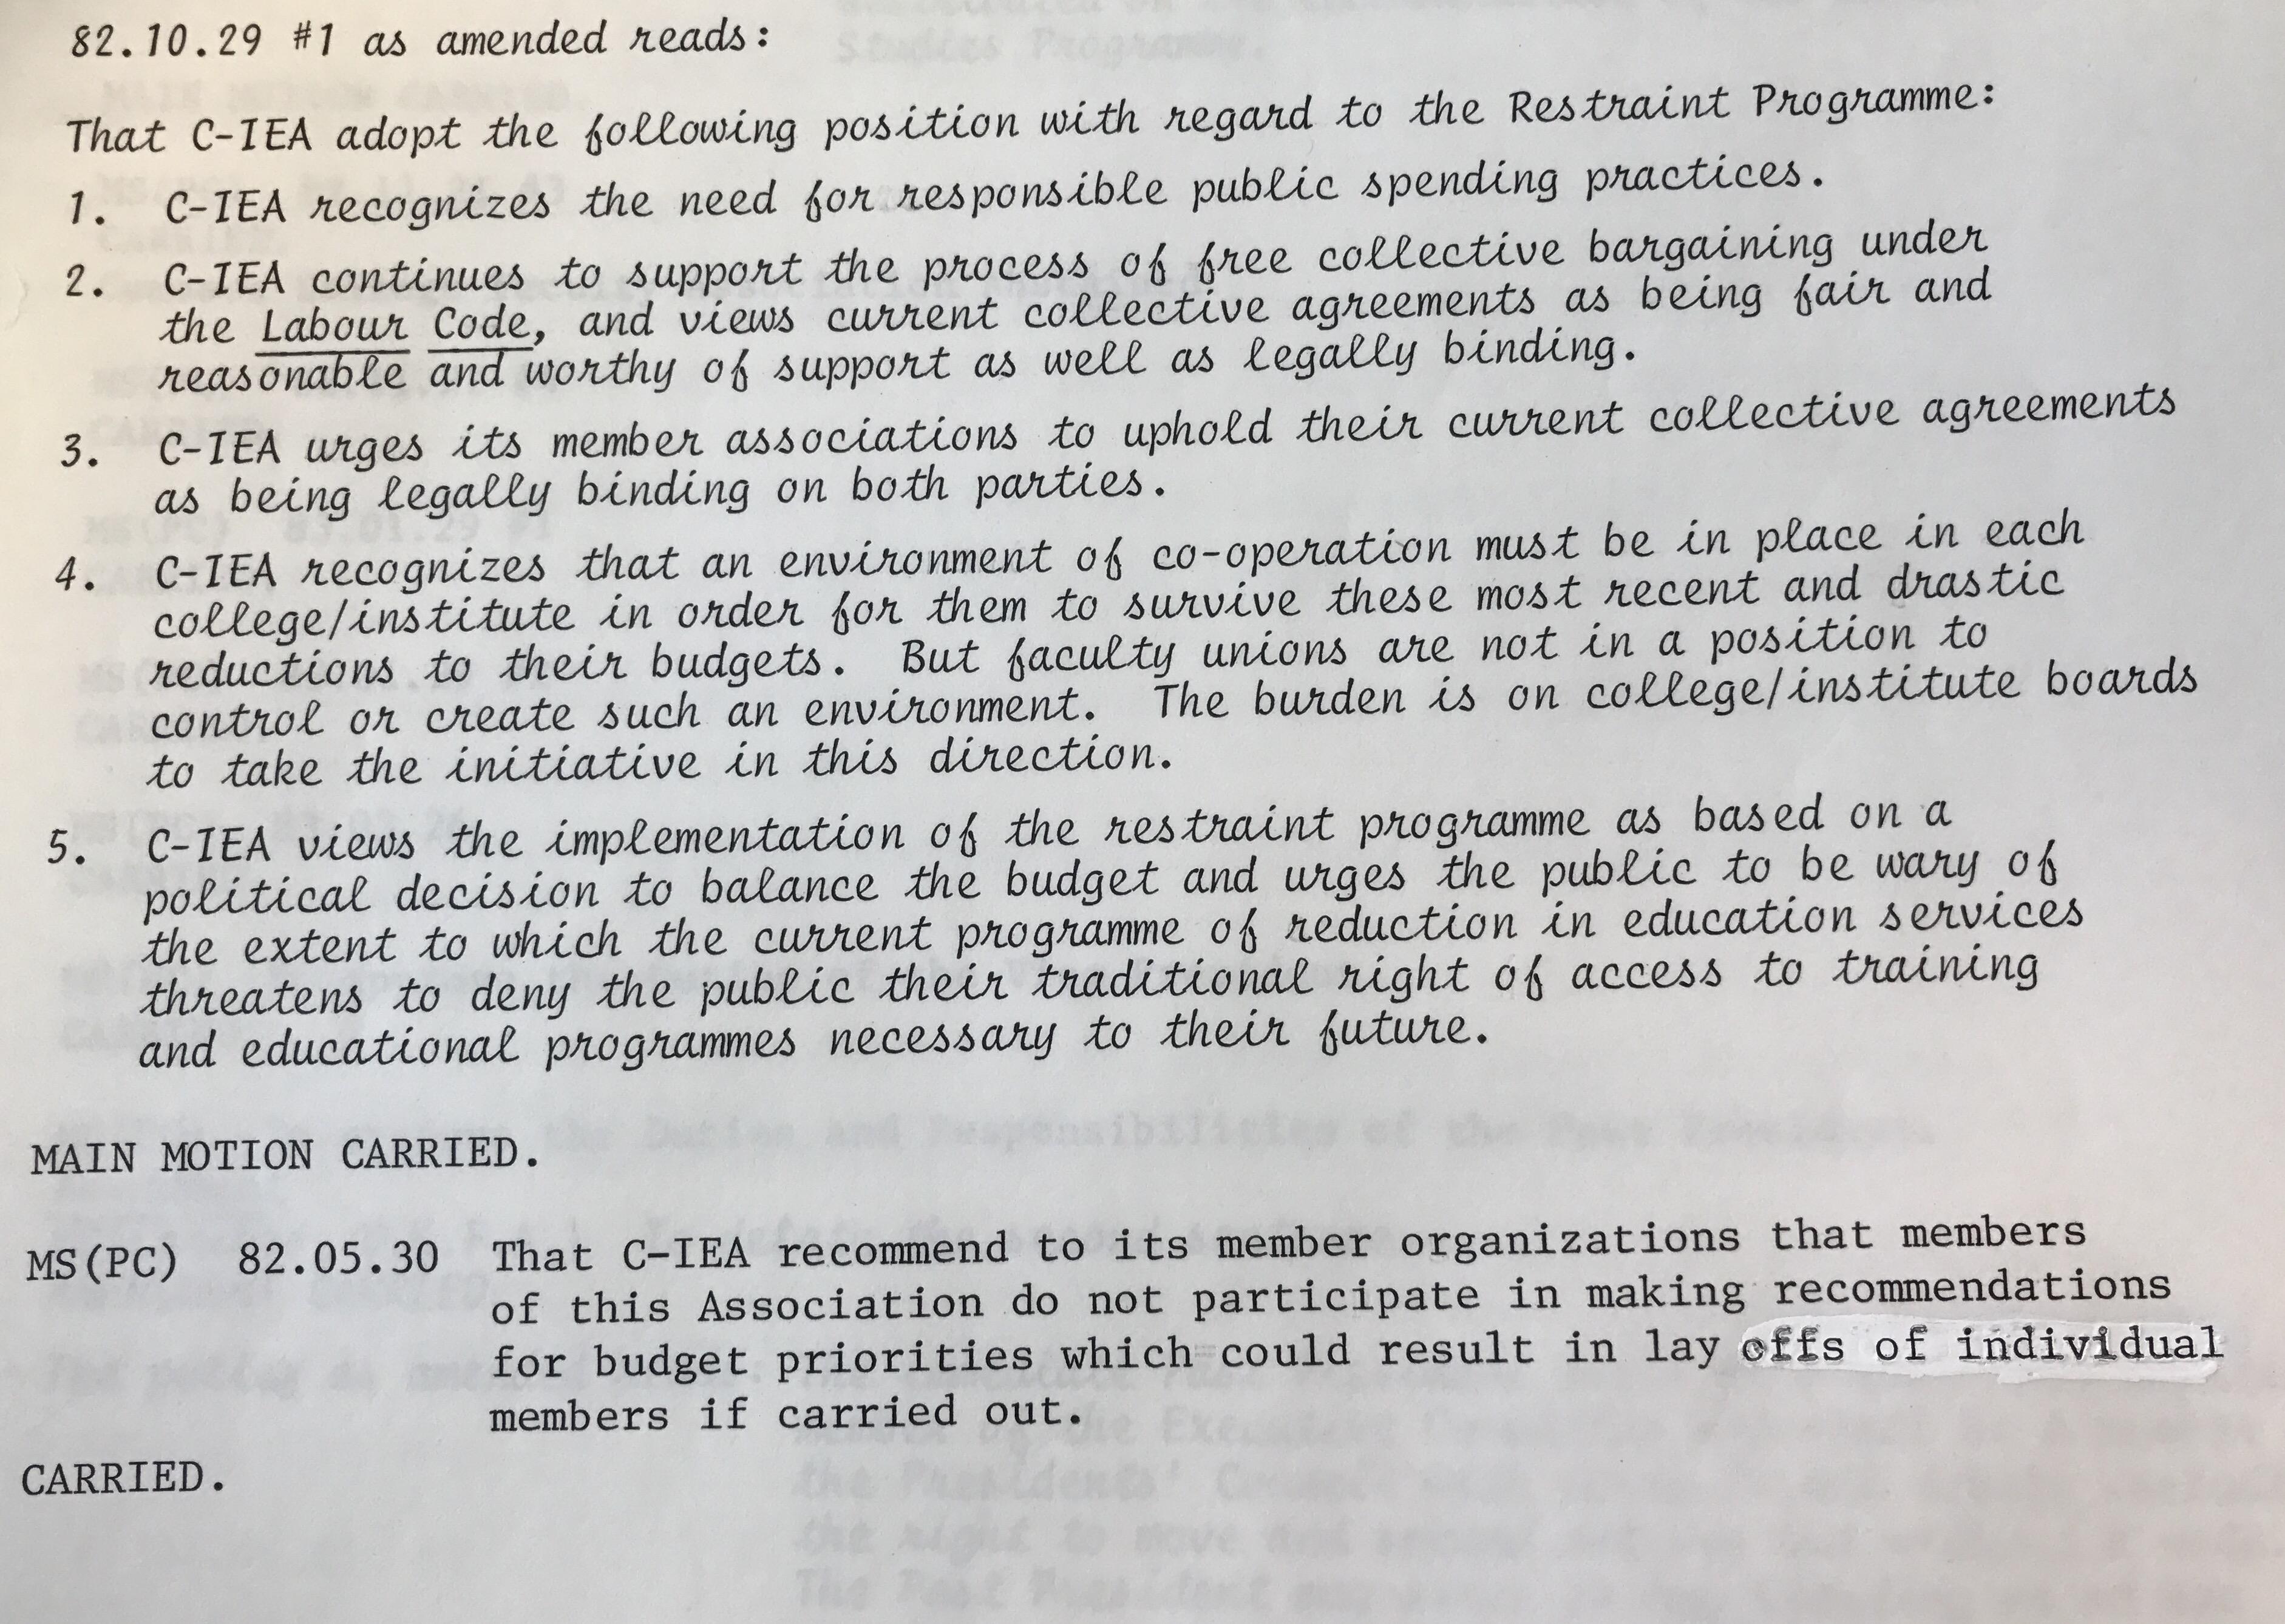 1983 AGM Resolution on restraint program